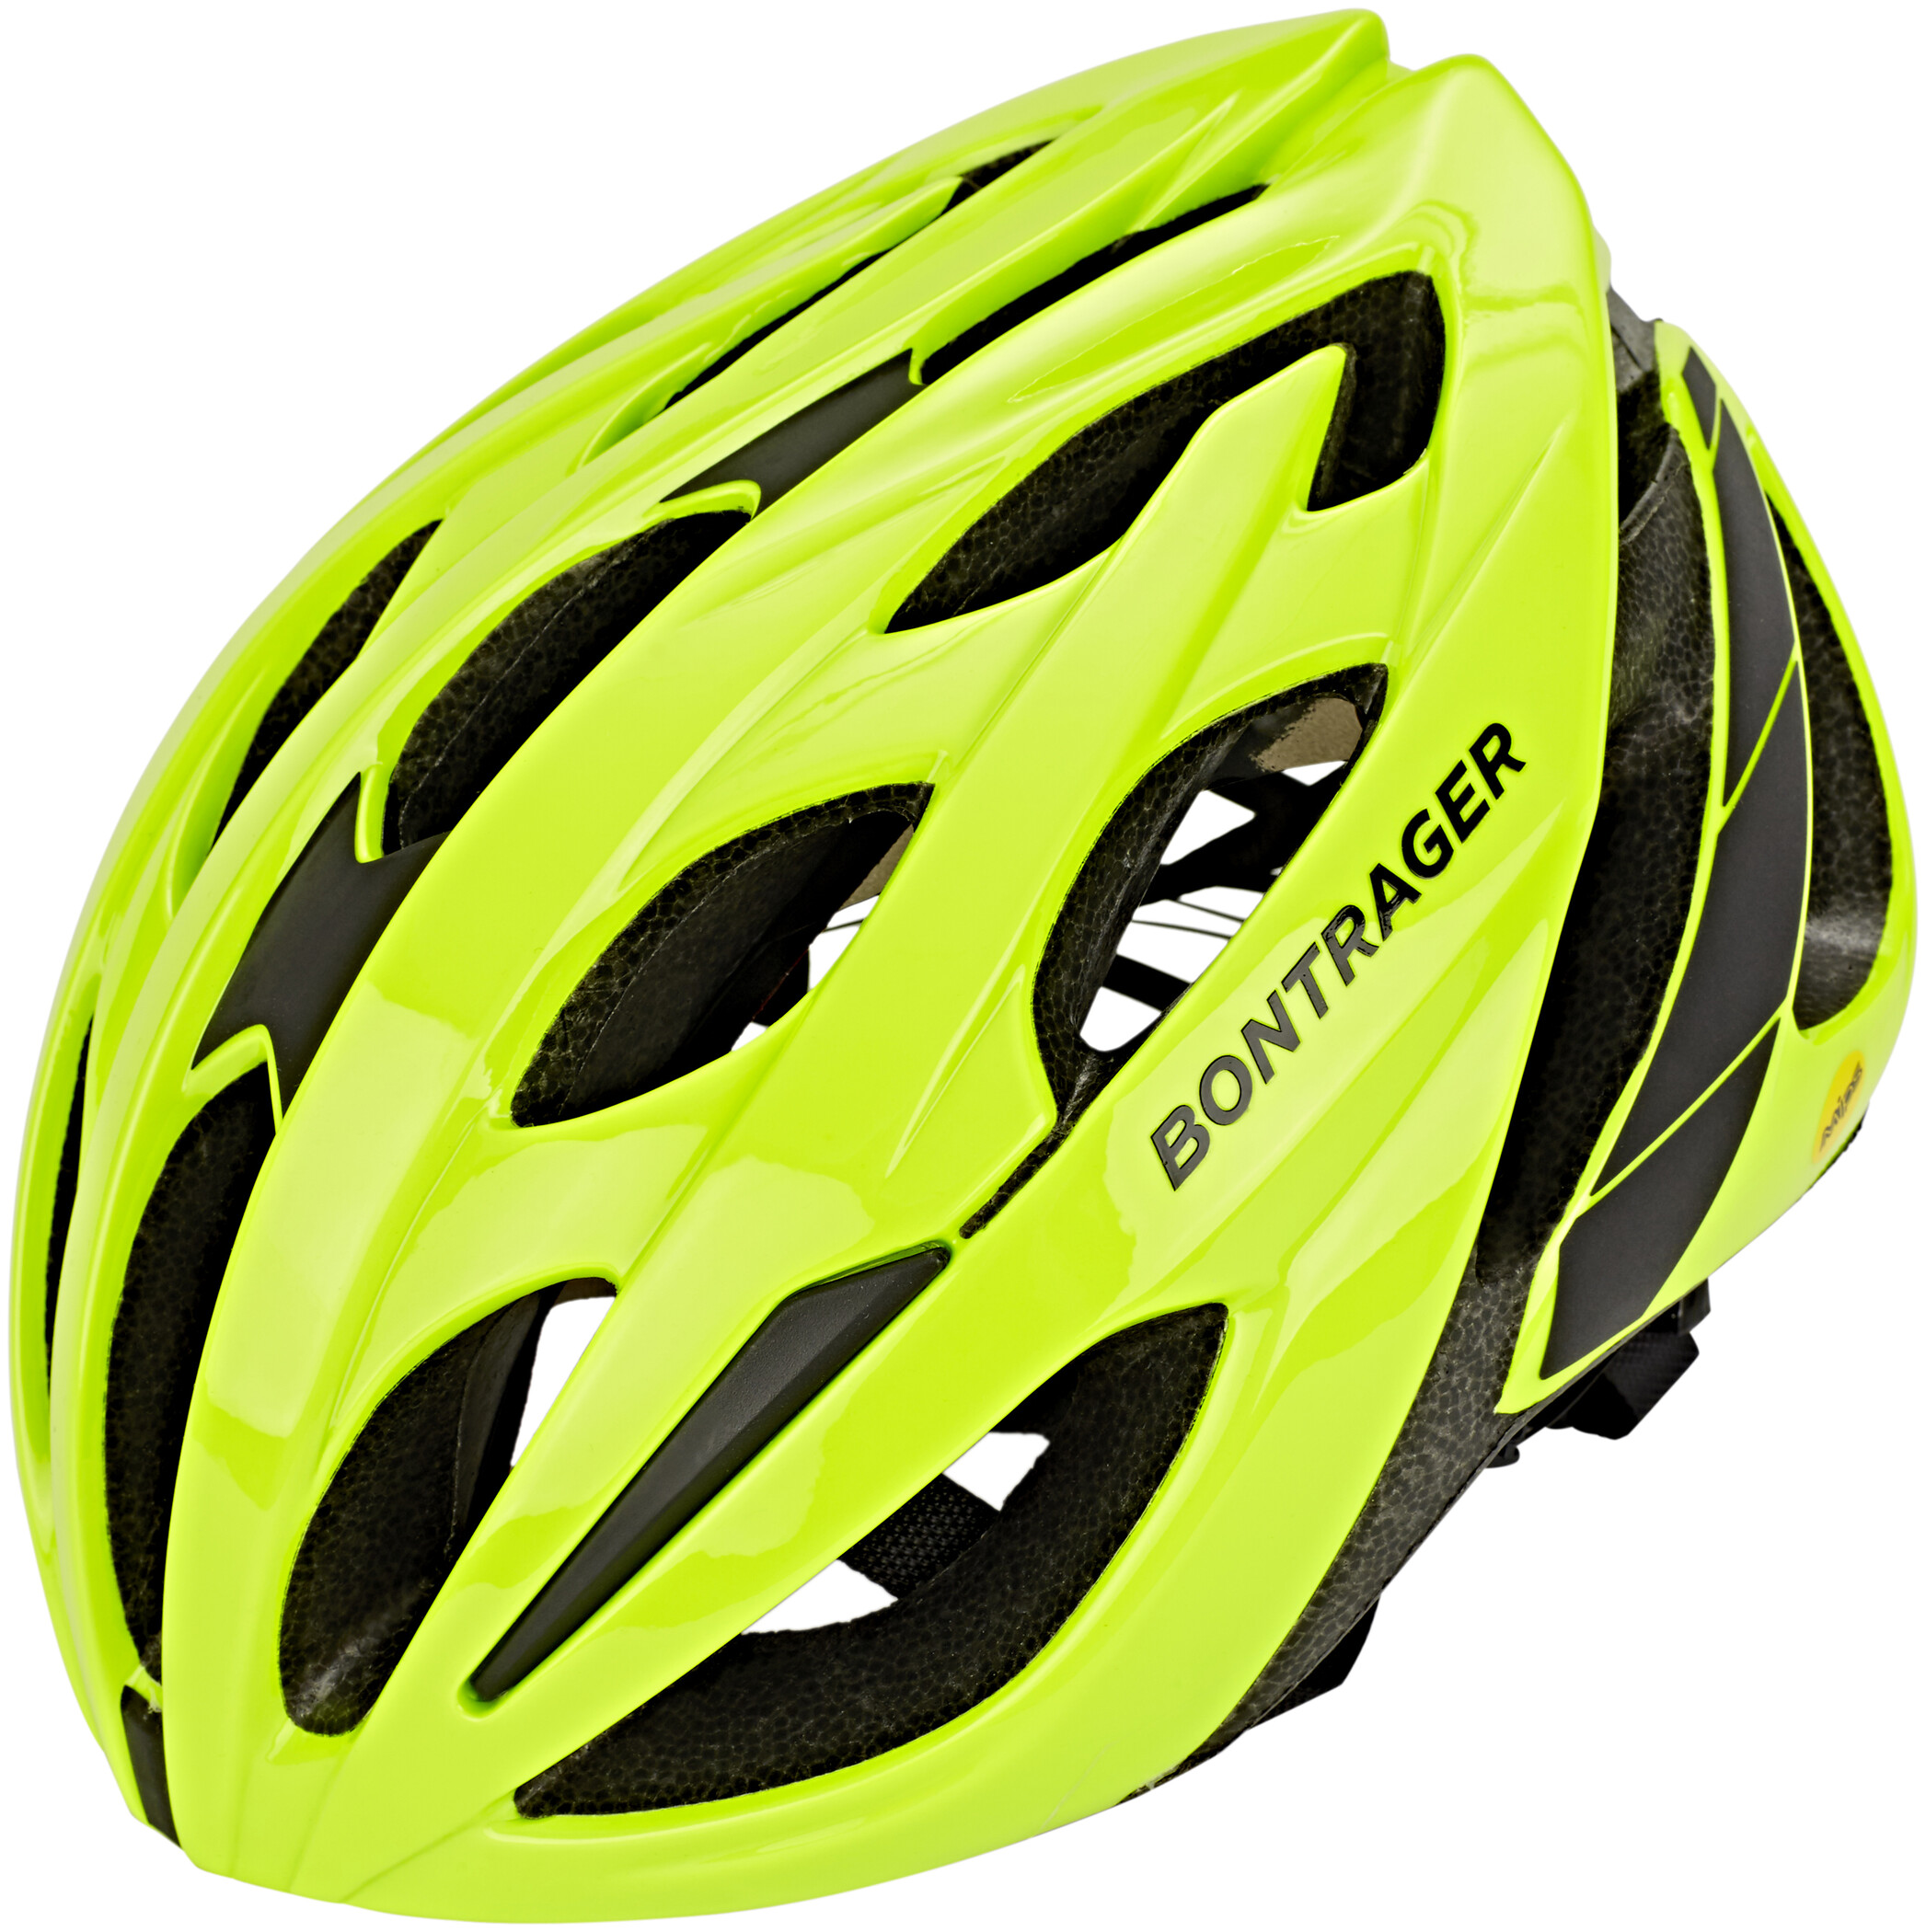 Bontrager Starvos MIPS CE Cykelhjelm Herrer, visibility yellow (2019) | Hjelme